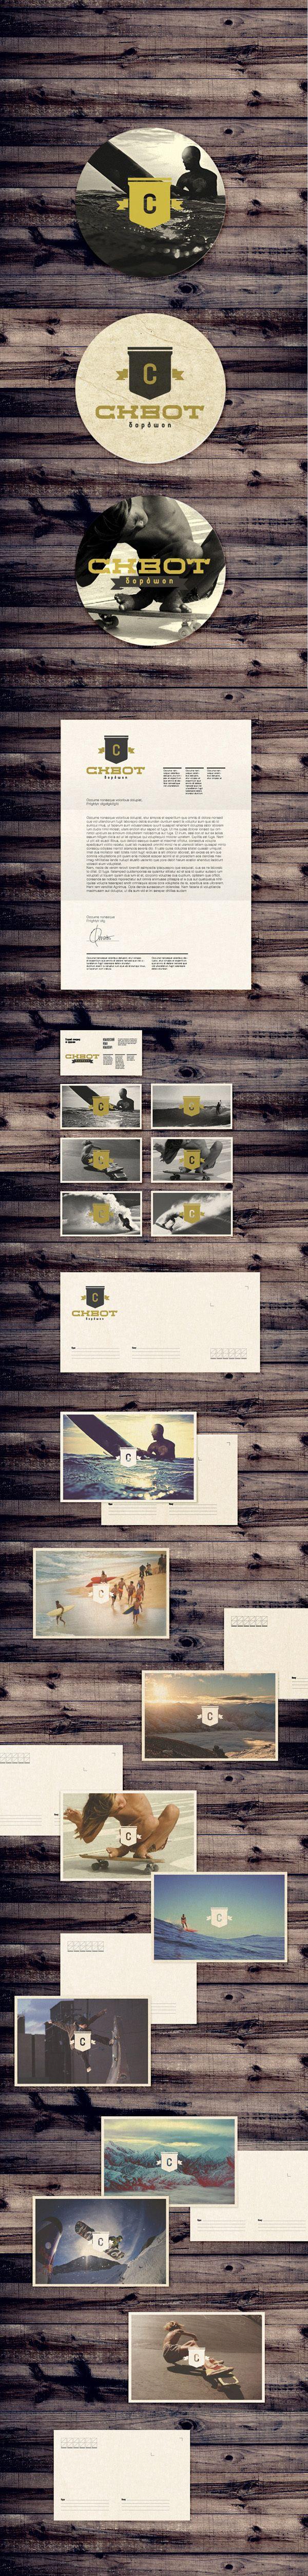 Rebranding Concept for Russian Boardshop